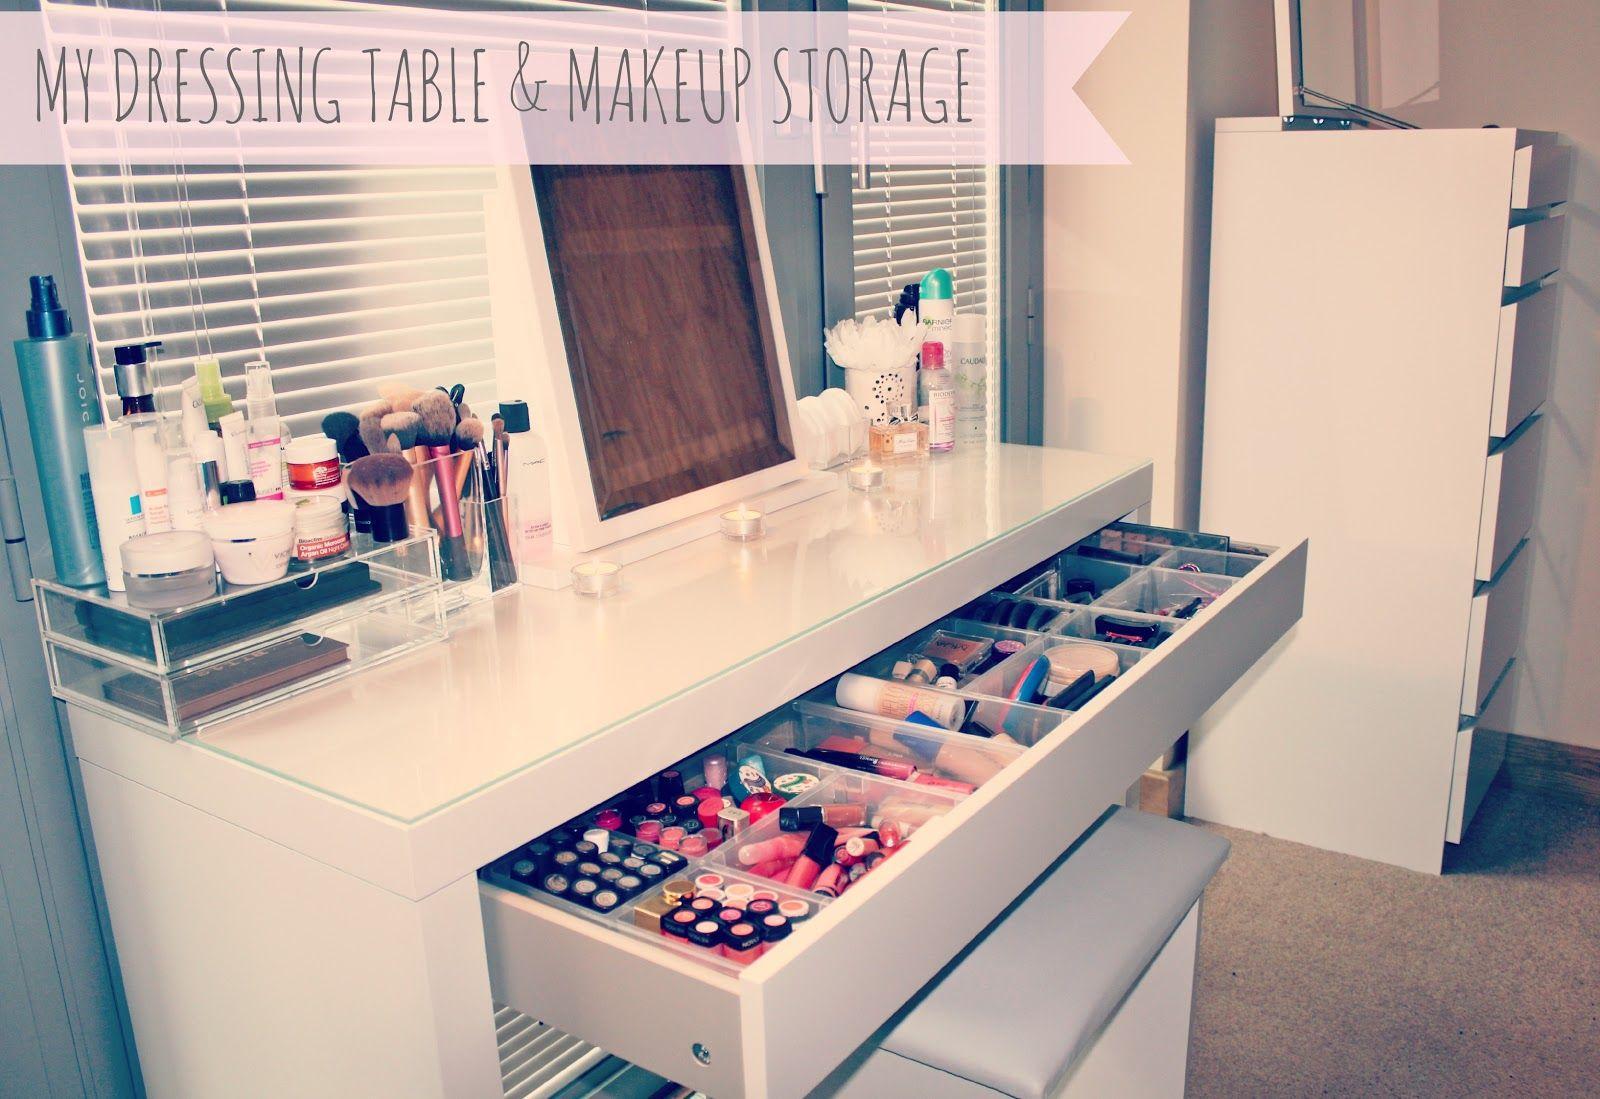 My Makeup Storage Ikea Malm Dressing Table Ikea Malm Dressing Table Malm Dressing Table Makeup Storage